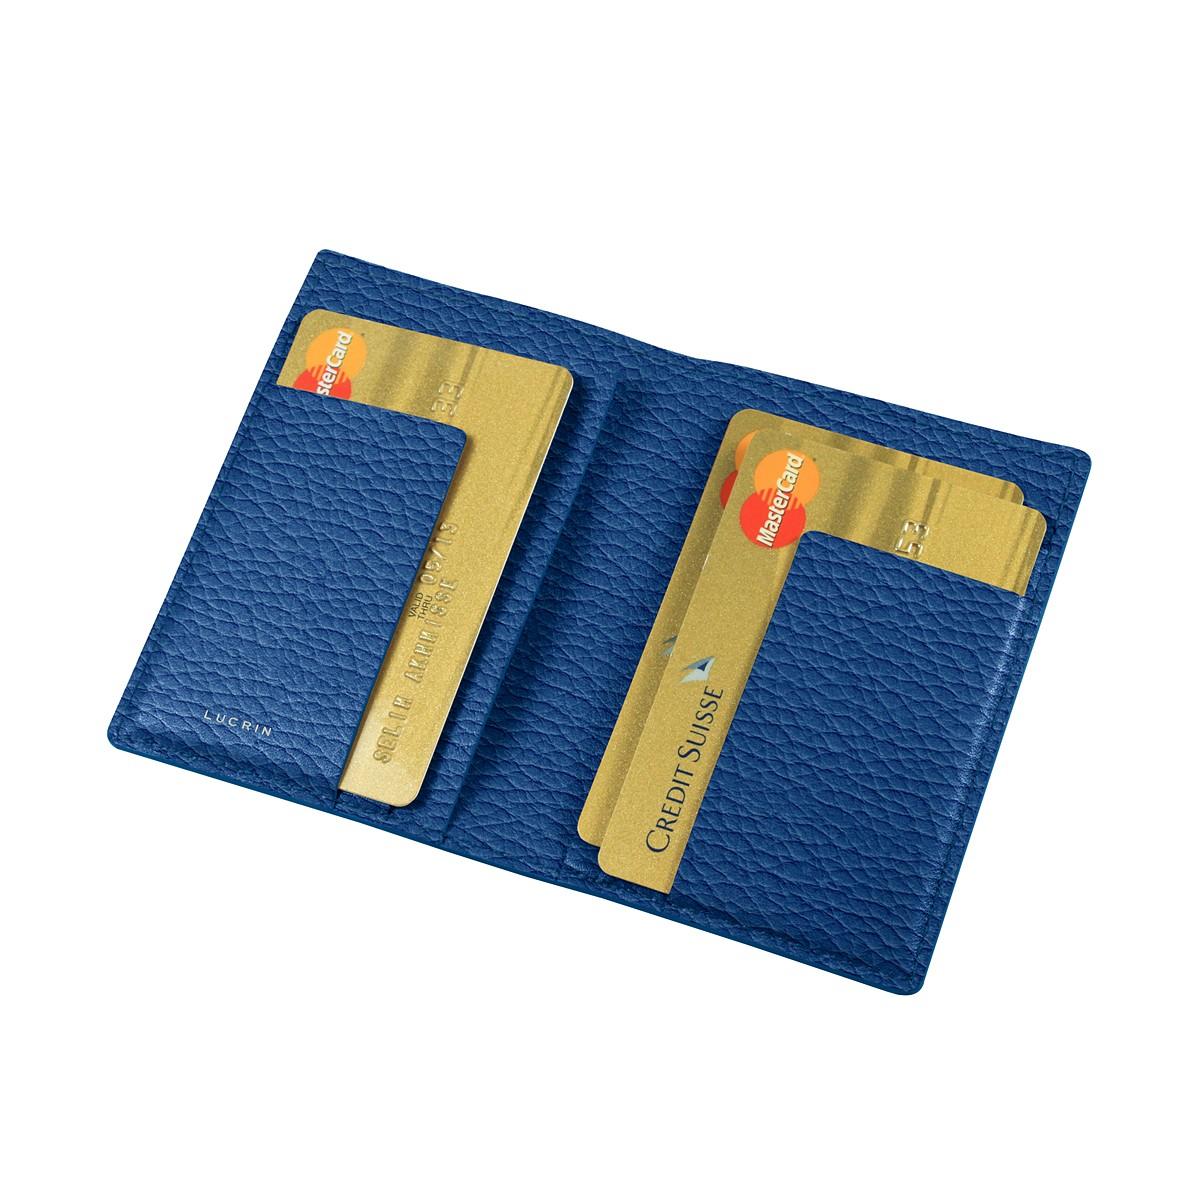 Porte-cartes à 6 poches plates